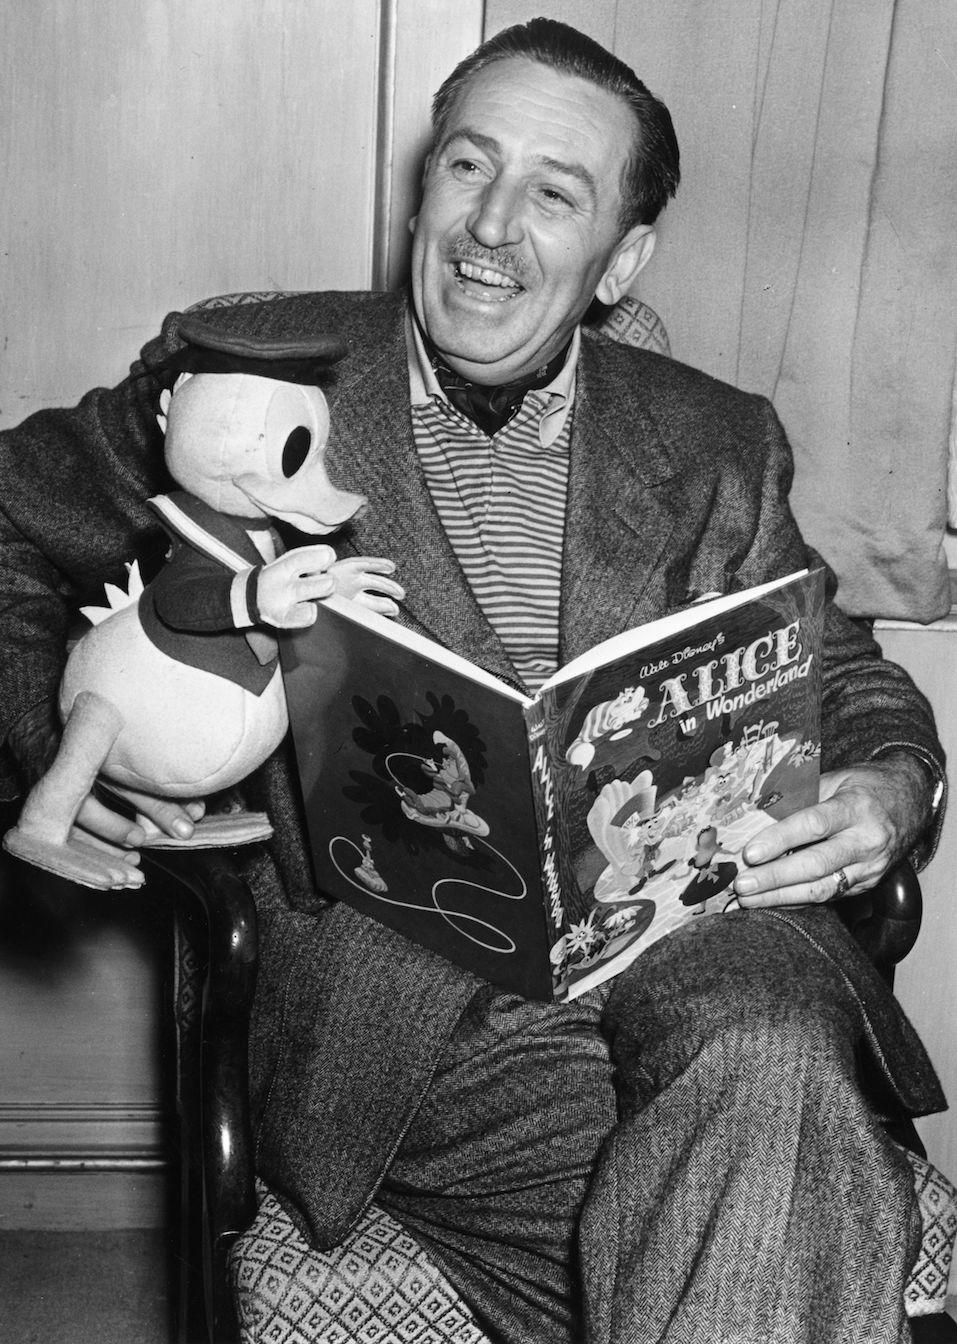 Creator of Mickey Mouse Walt Disney (1901-1966) arrives in London